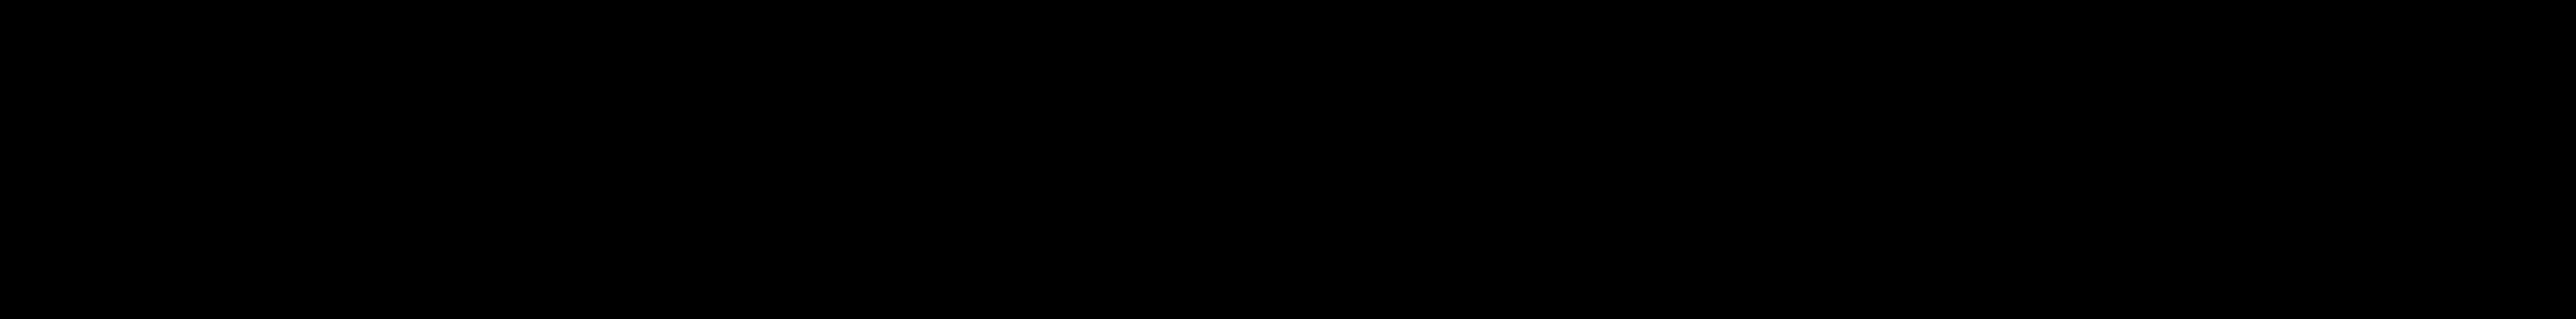 reebok logo 4 - Reebok Logo